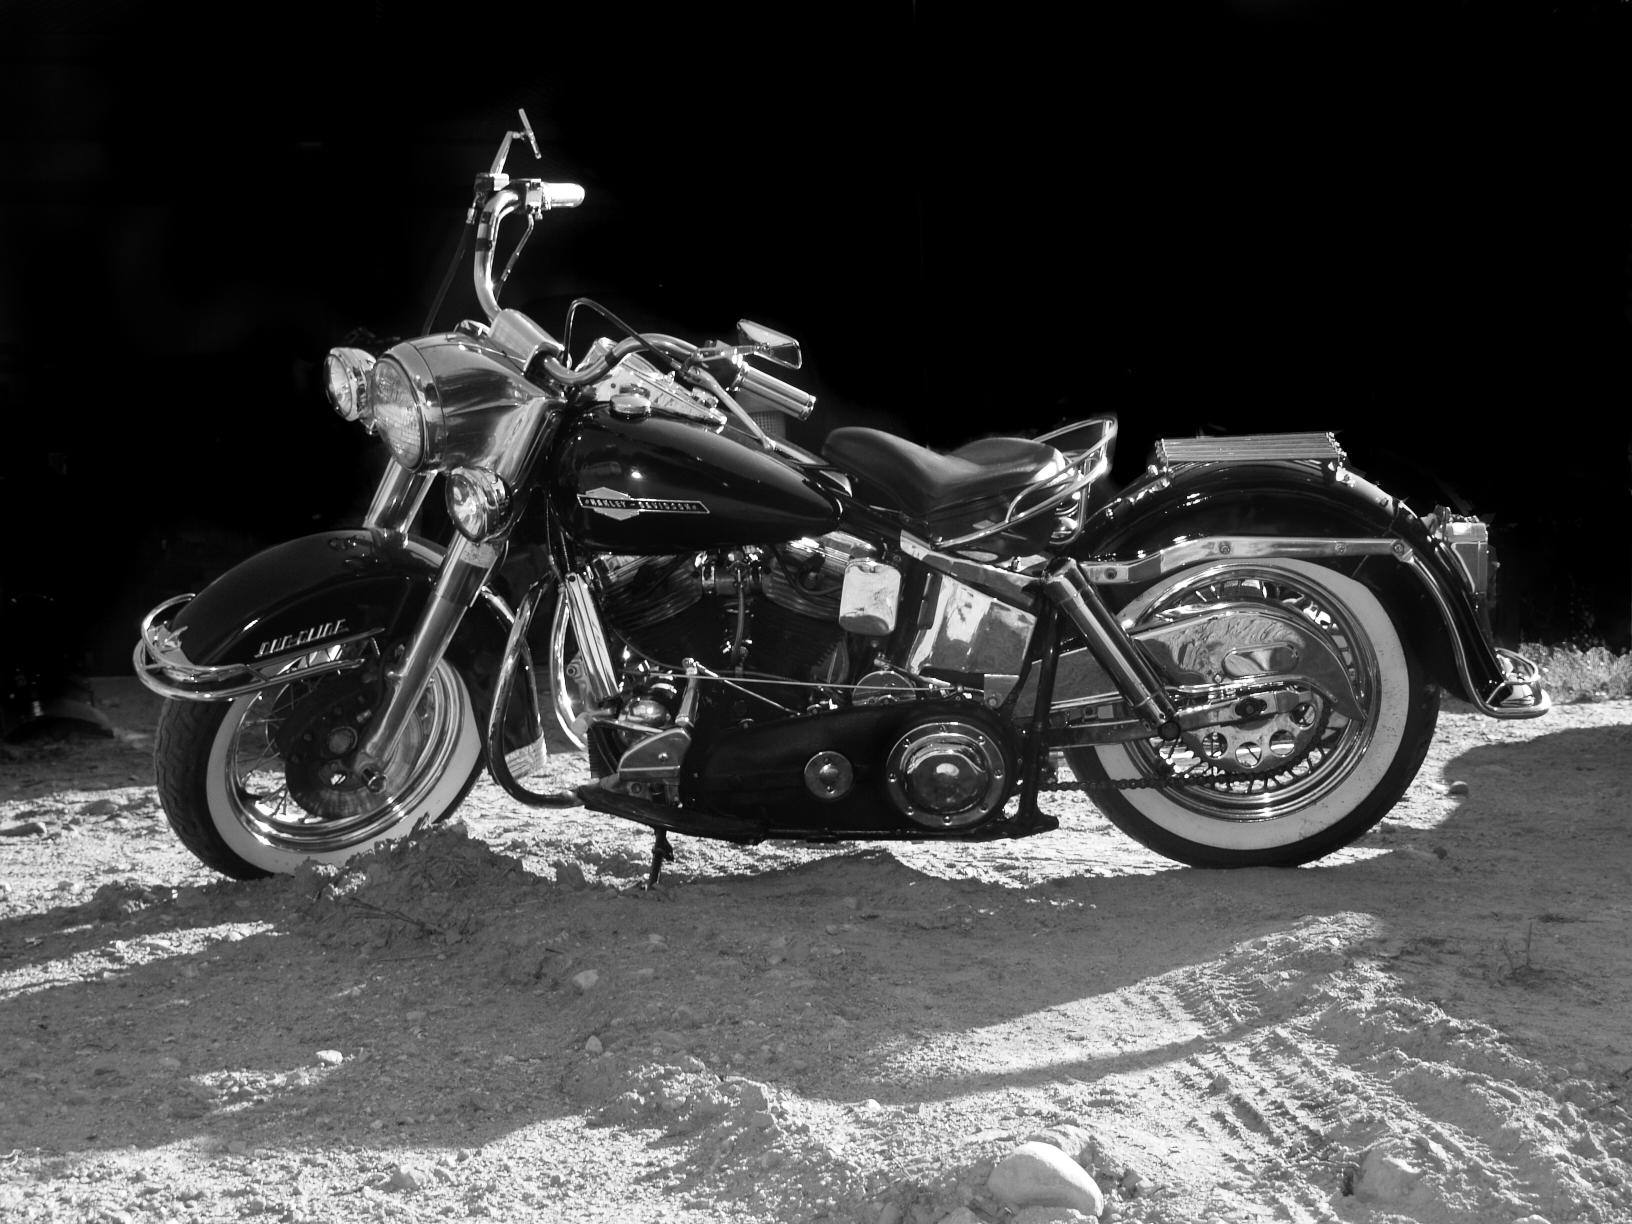 Harley_01, cruiser